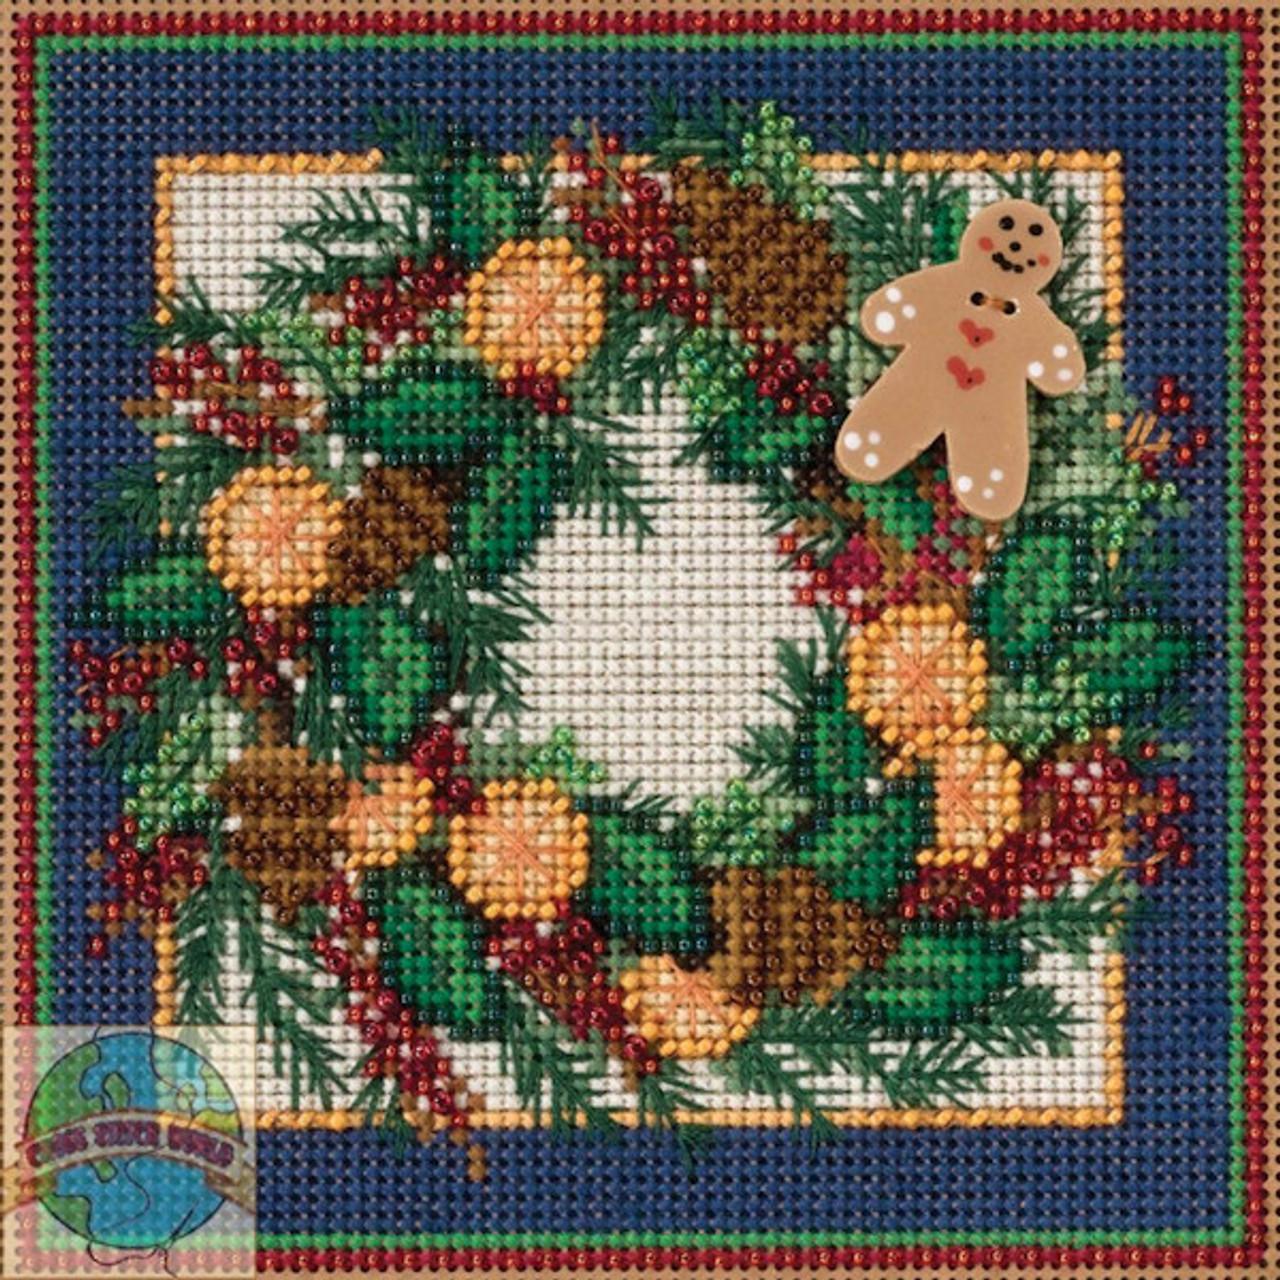 2015 Mill Hill Buttons & Beads Winter Series  - Spiced Wreath